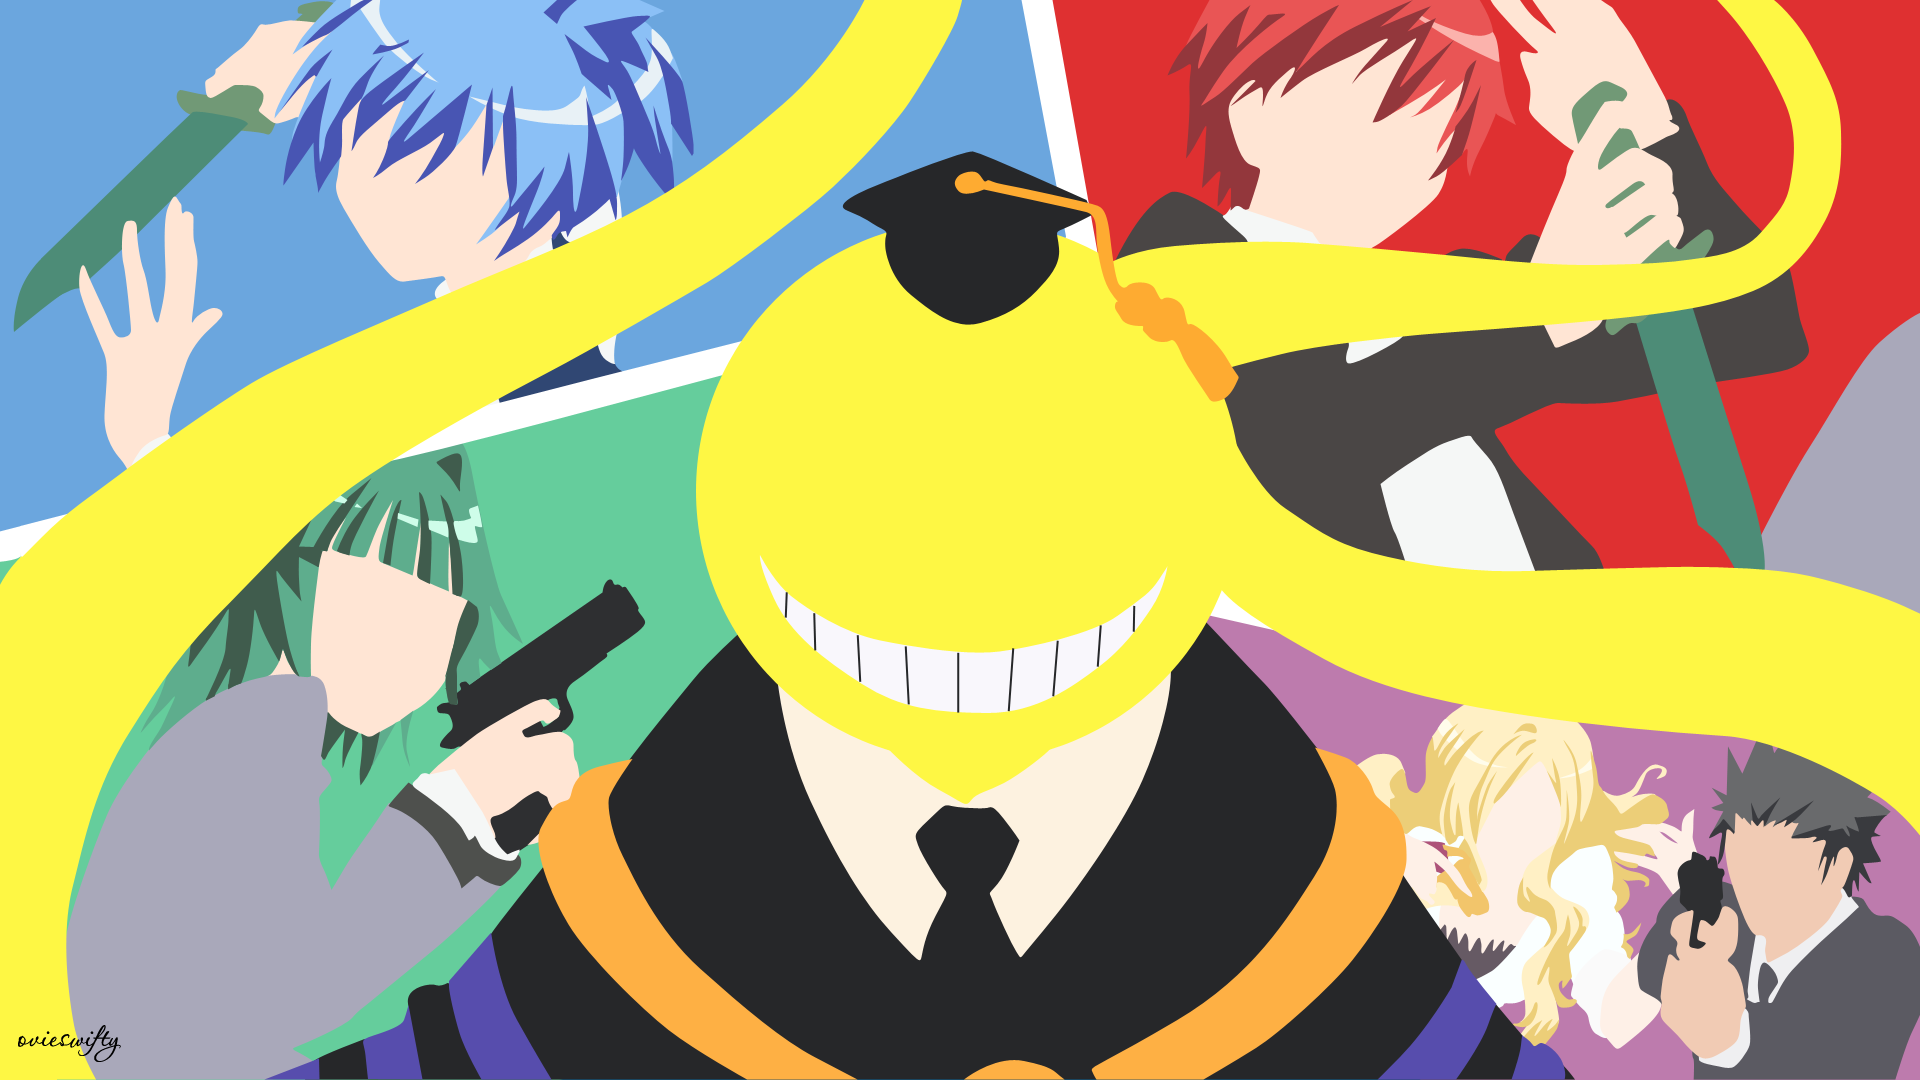 Assassination Classroom On Minimalistic Animoo Deviantart Assassination Classroom Classroom Minimalist Anime Wallpaper